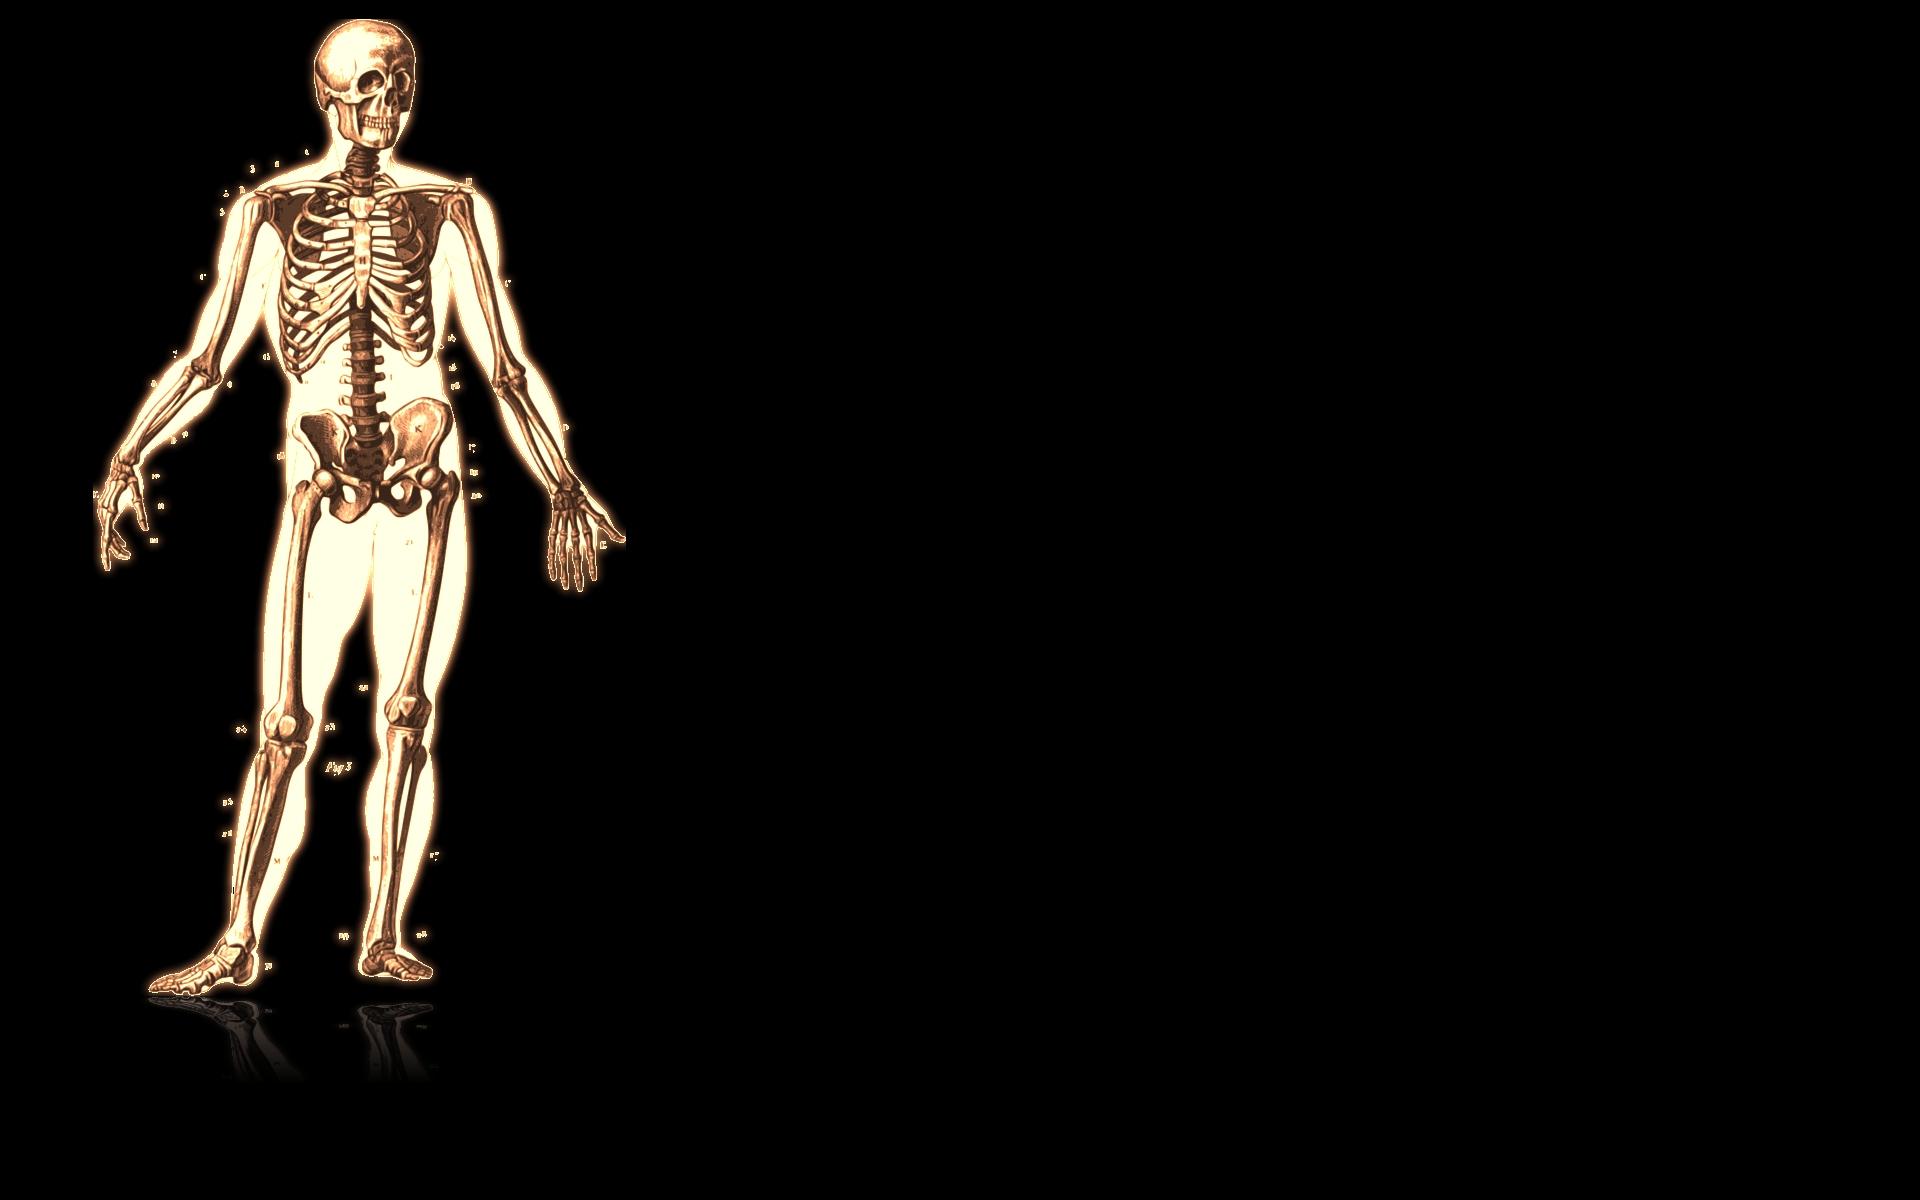 anatomy wallpaper background - photo #34